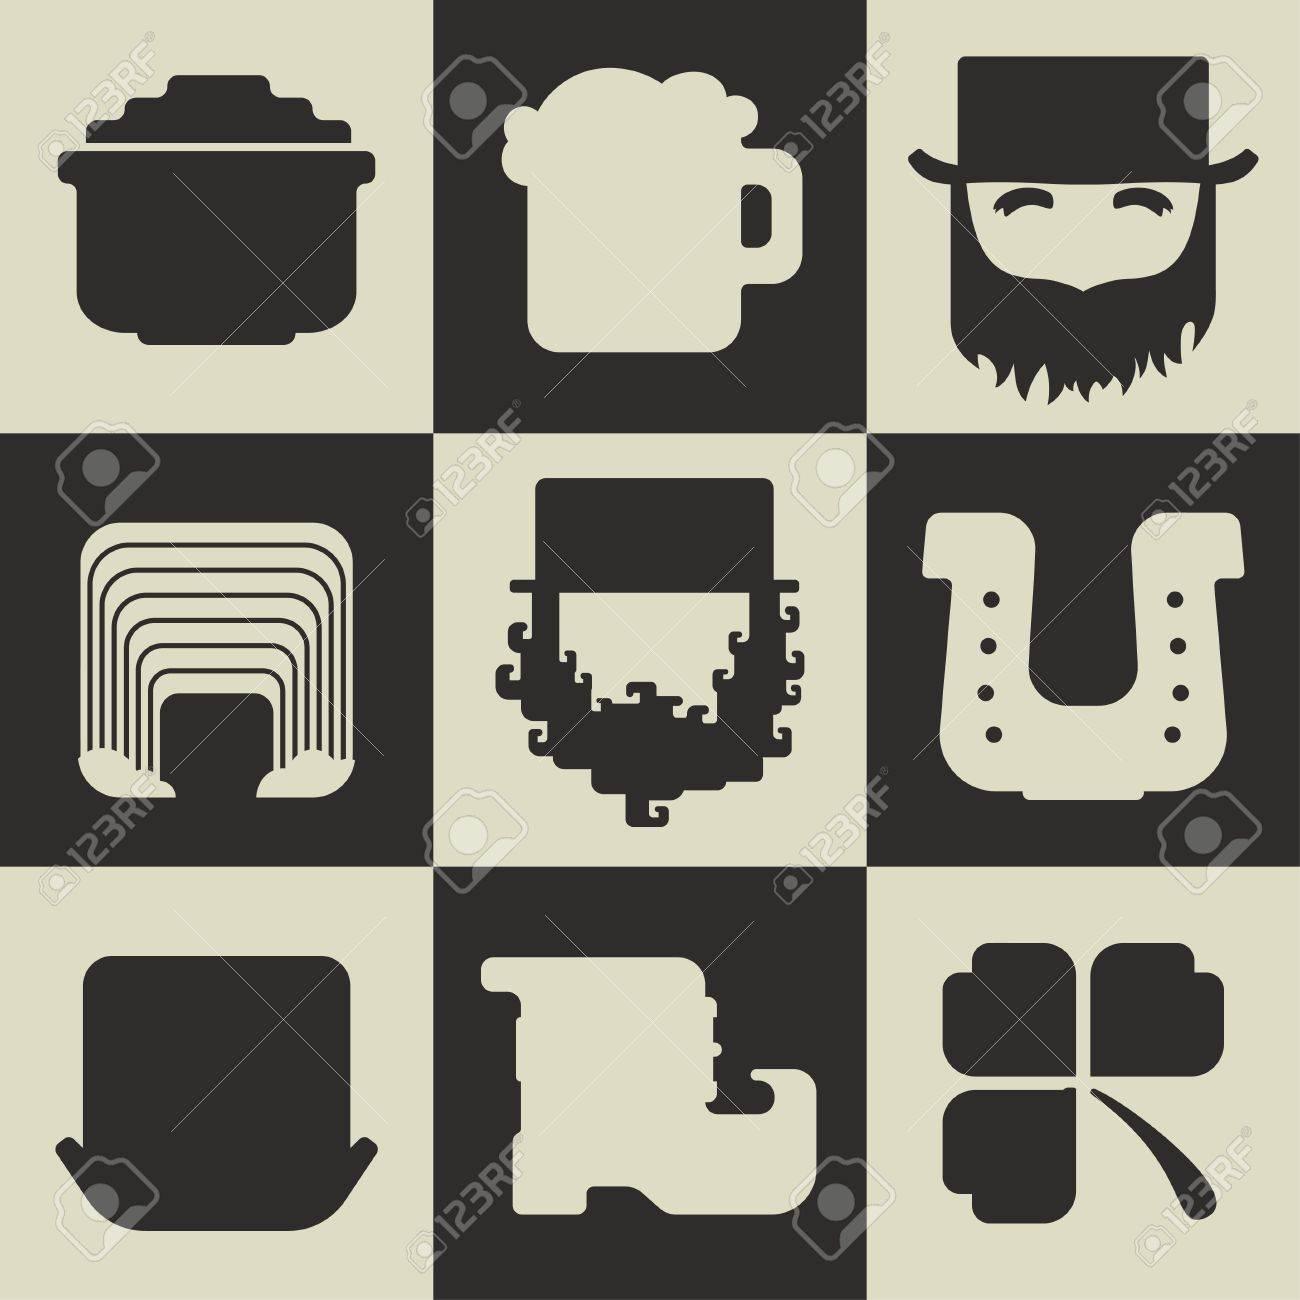 Set of black and white flat icons on a plain background a symbol set of black and white flat icons on a plain background a symbol of good biocorpaavc Choice Image